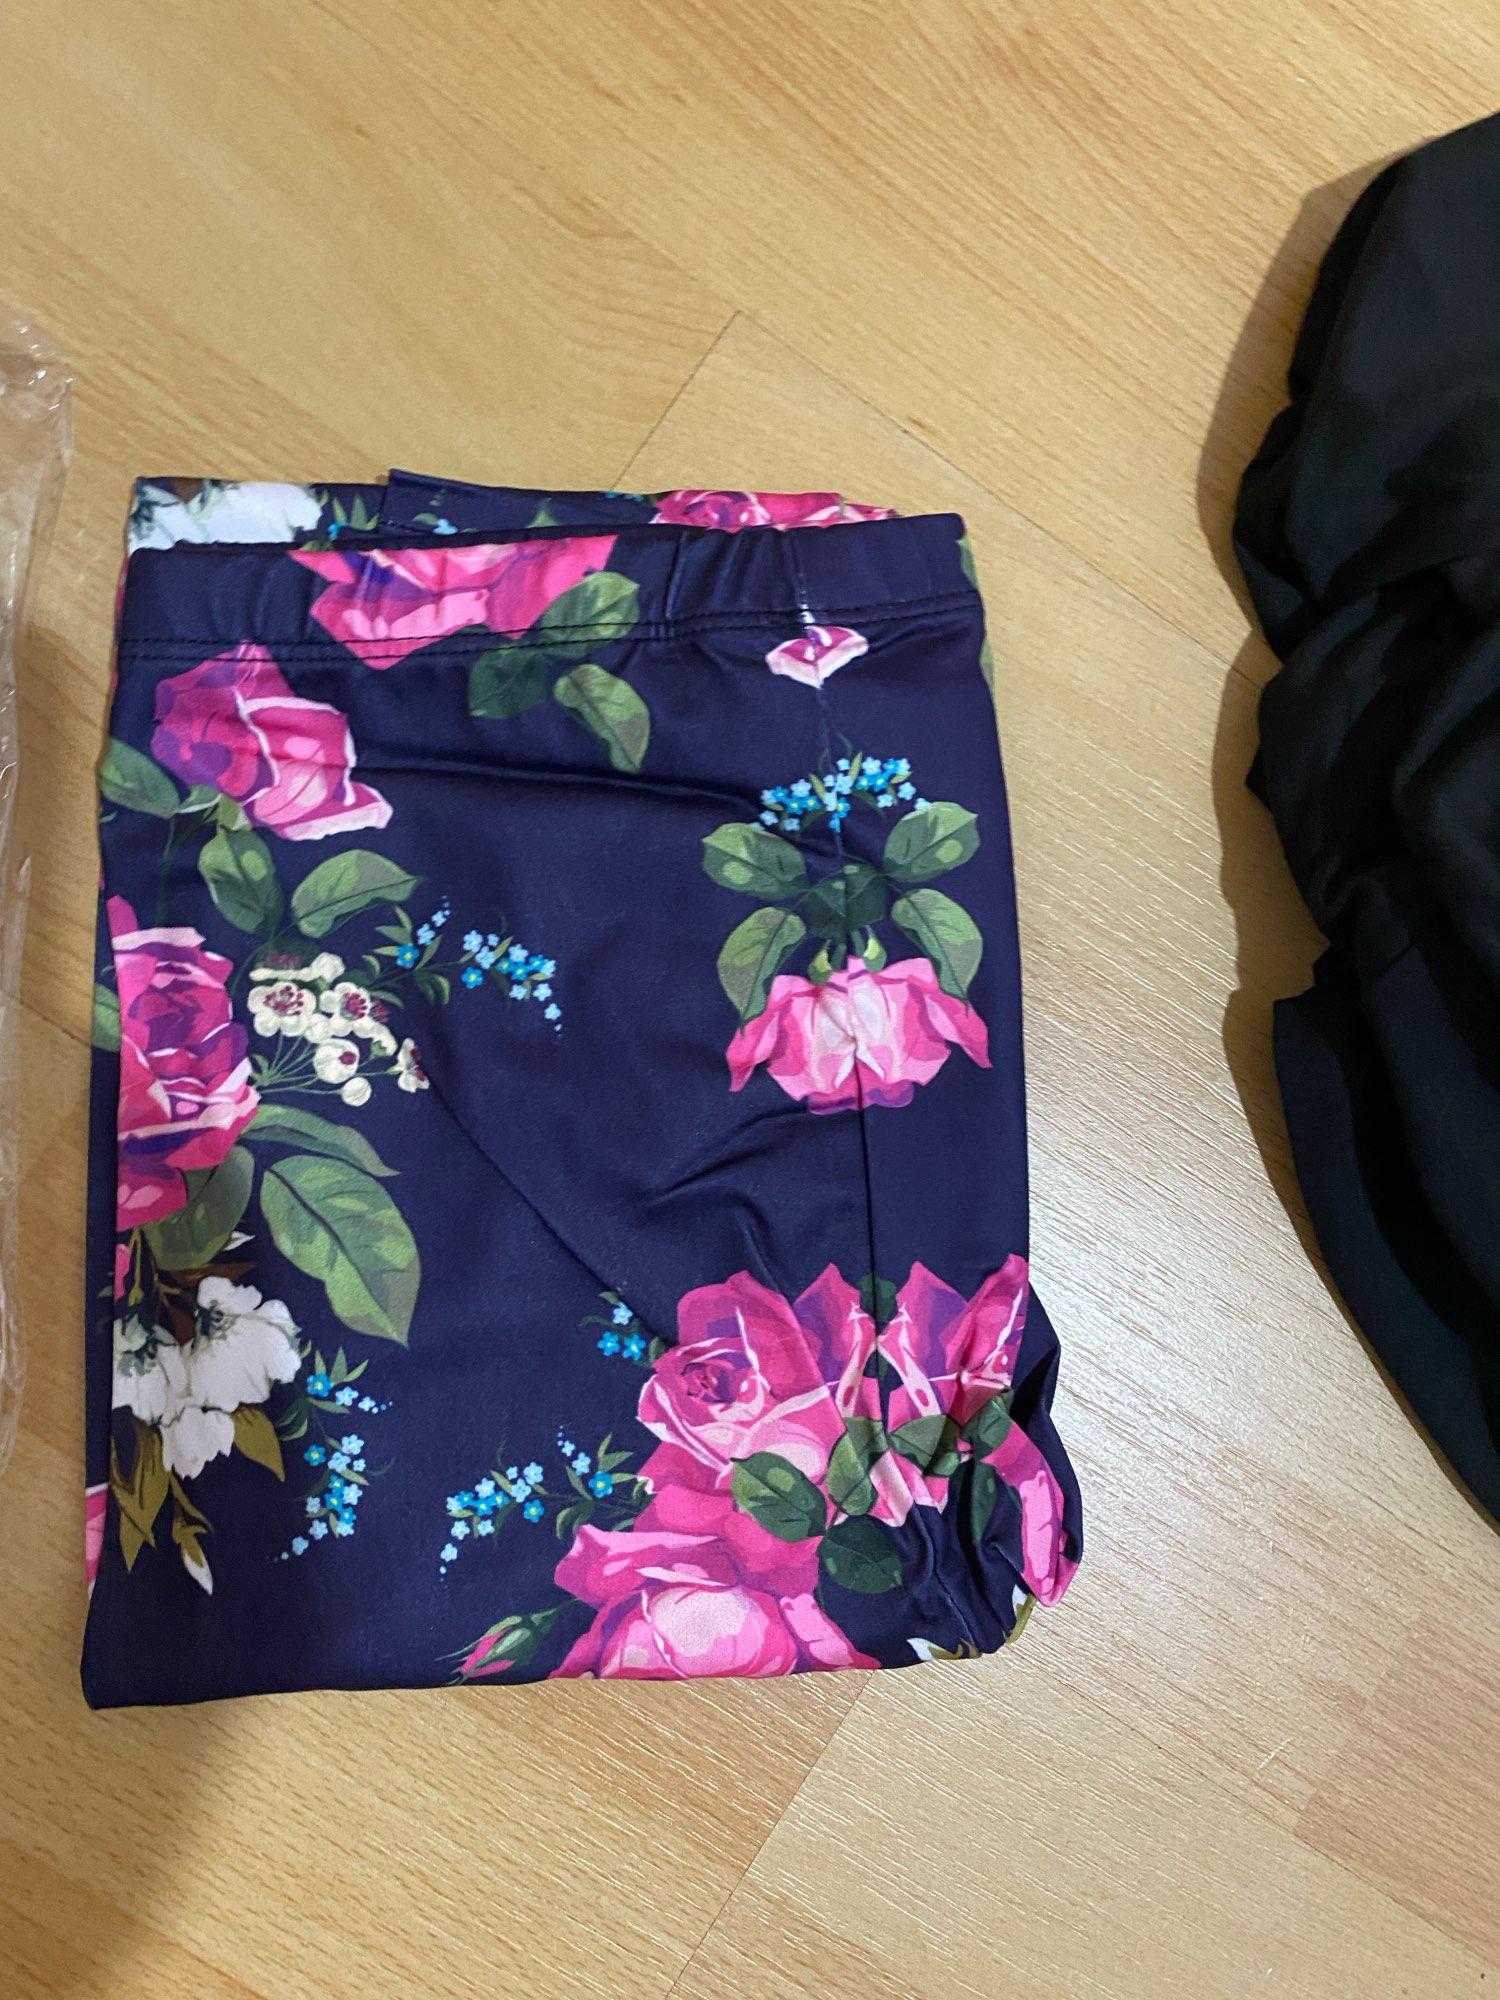 Brands Women Fashion Legging Aztec Round Ombre Printing leggins Slim High Waist  Leggings Woman Pants|leggins slim|leggings aztechigh waist leggings - AliExpress